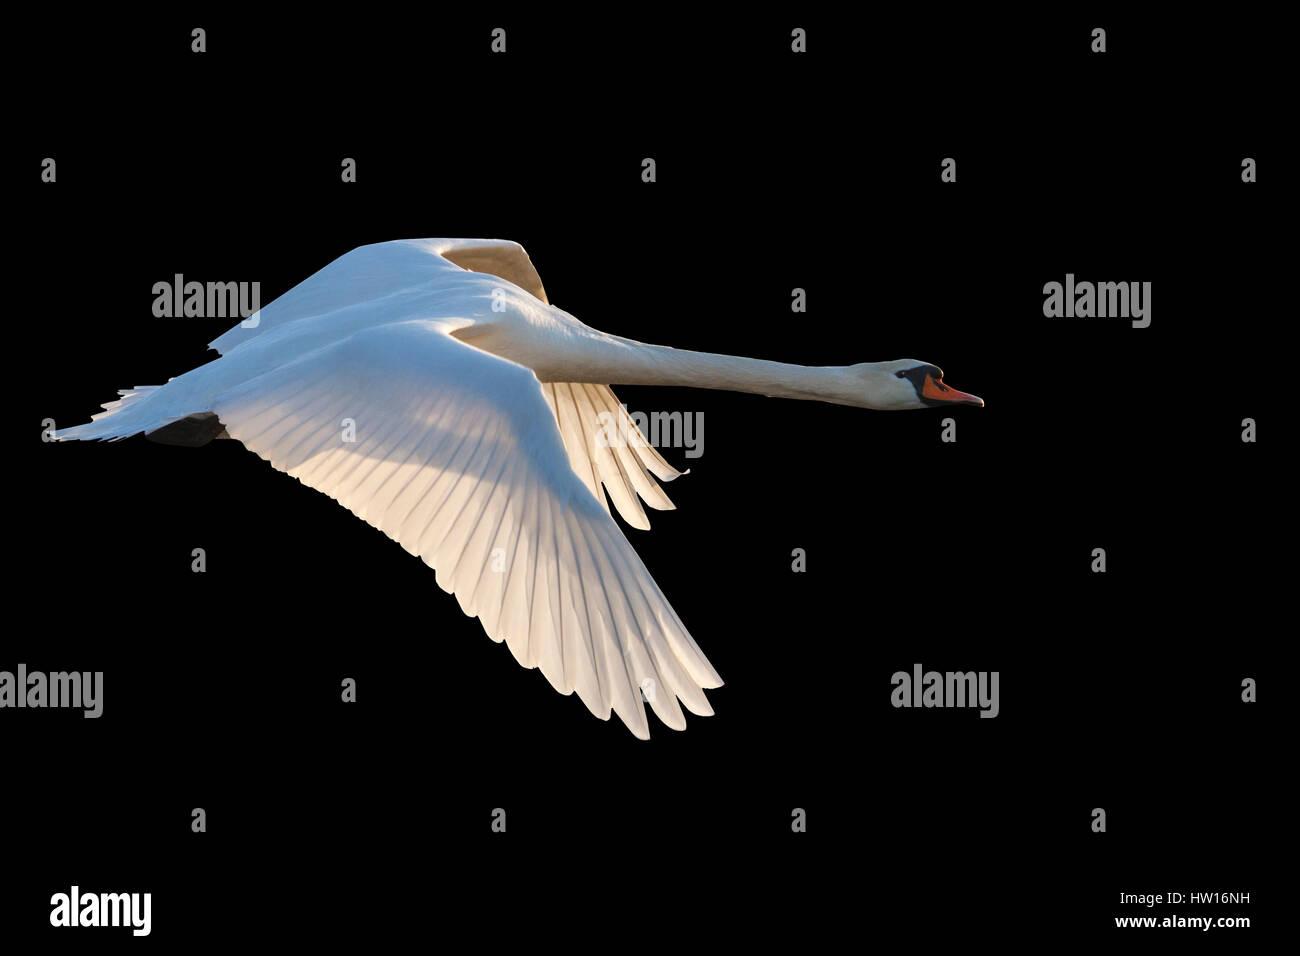 White Swan Flying On Black Backgroundbeautiful Birds White Birds